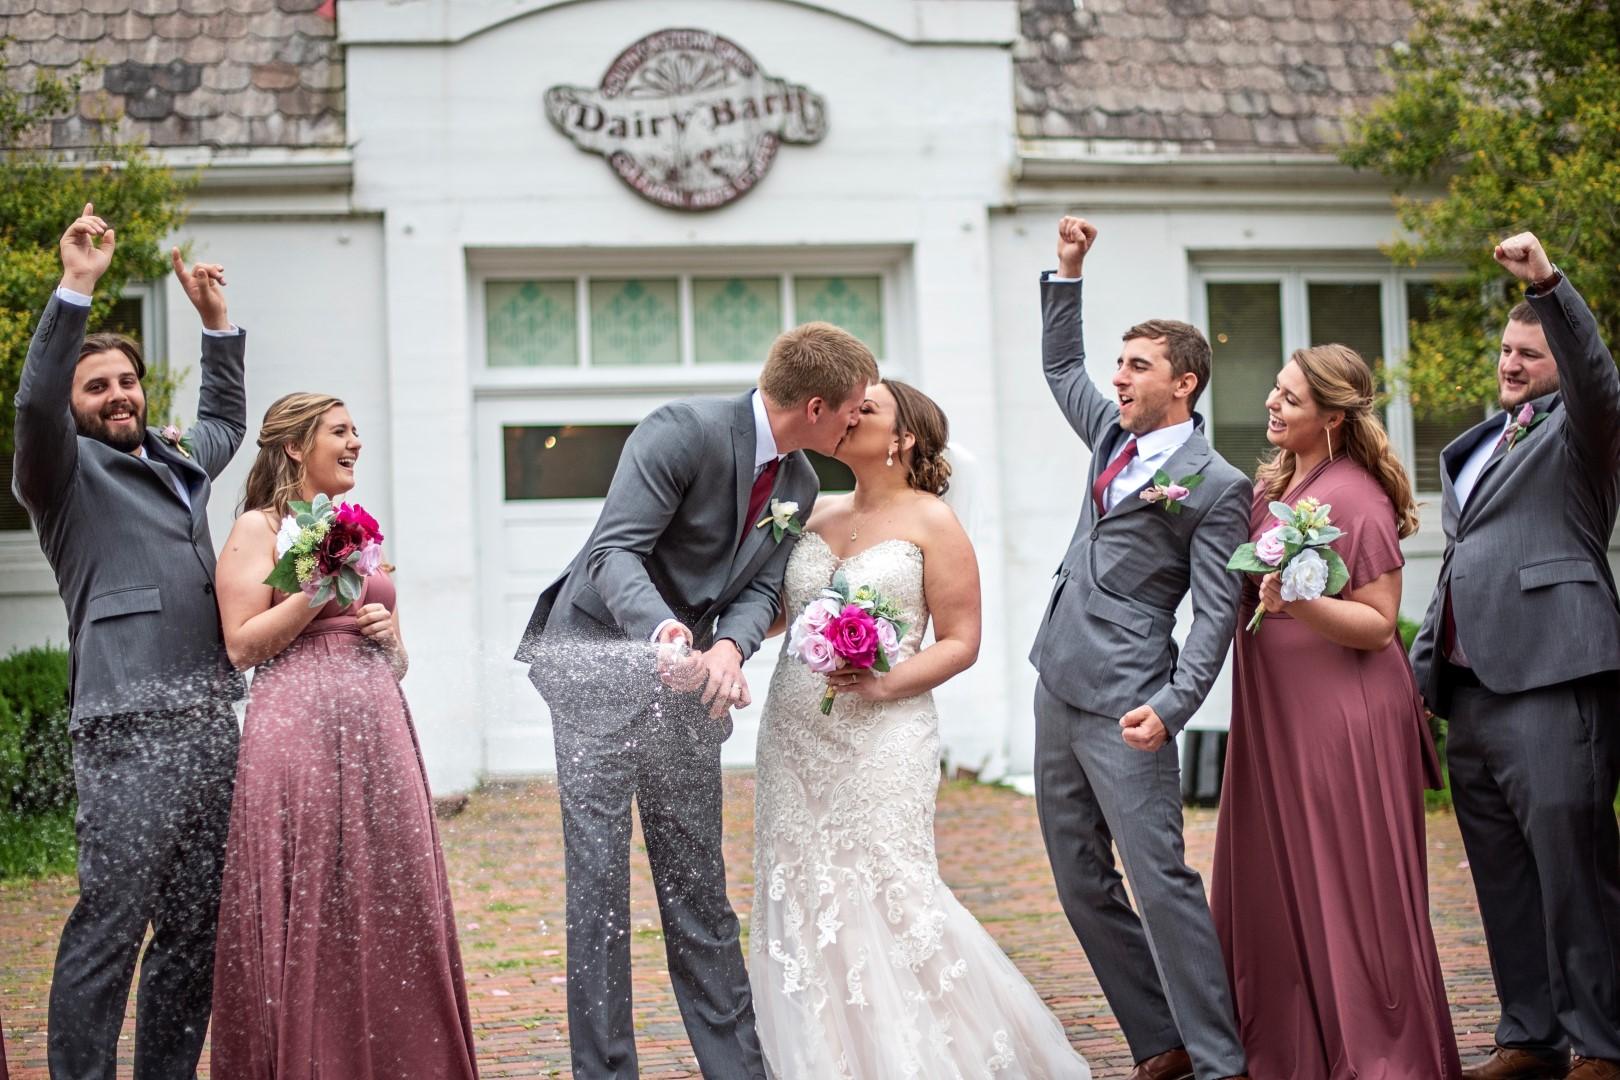 Courtney & Matt Dairy Barn Wedding May 2019_23 (Large).jpg